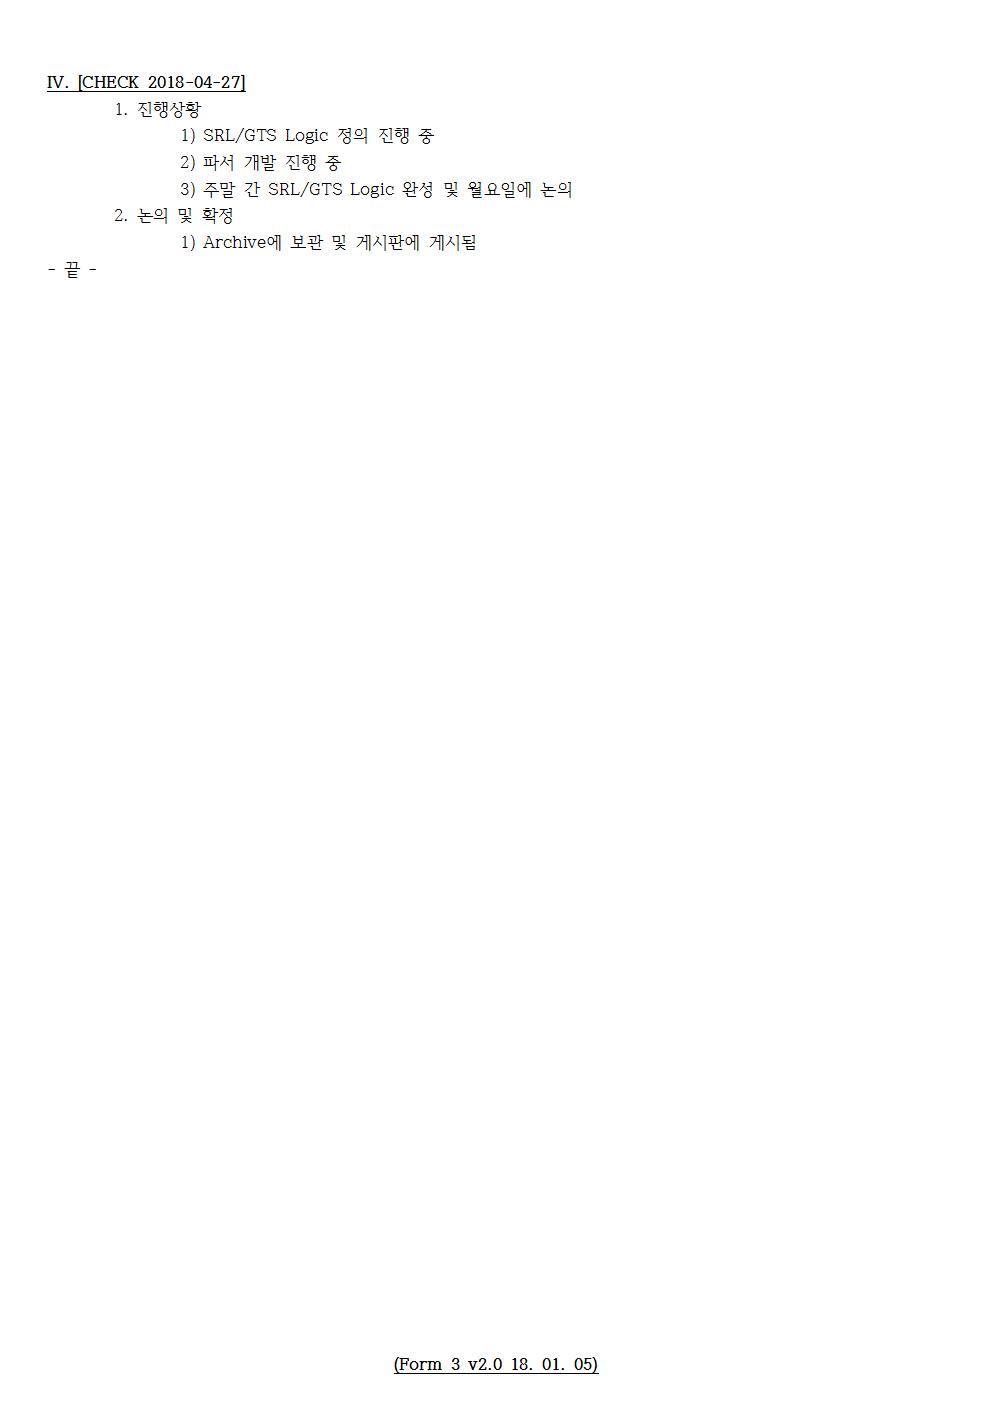 D-[18-001-RD-01]-[SAVE 3.0]-[2018-04-27][SH]002.jpg